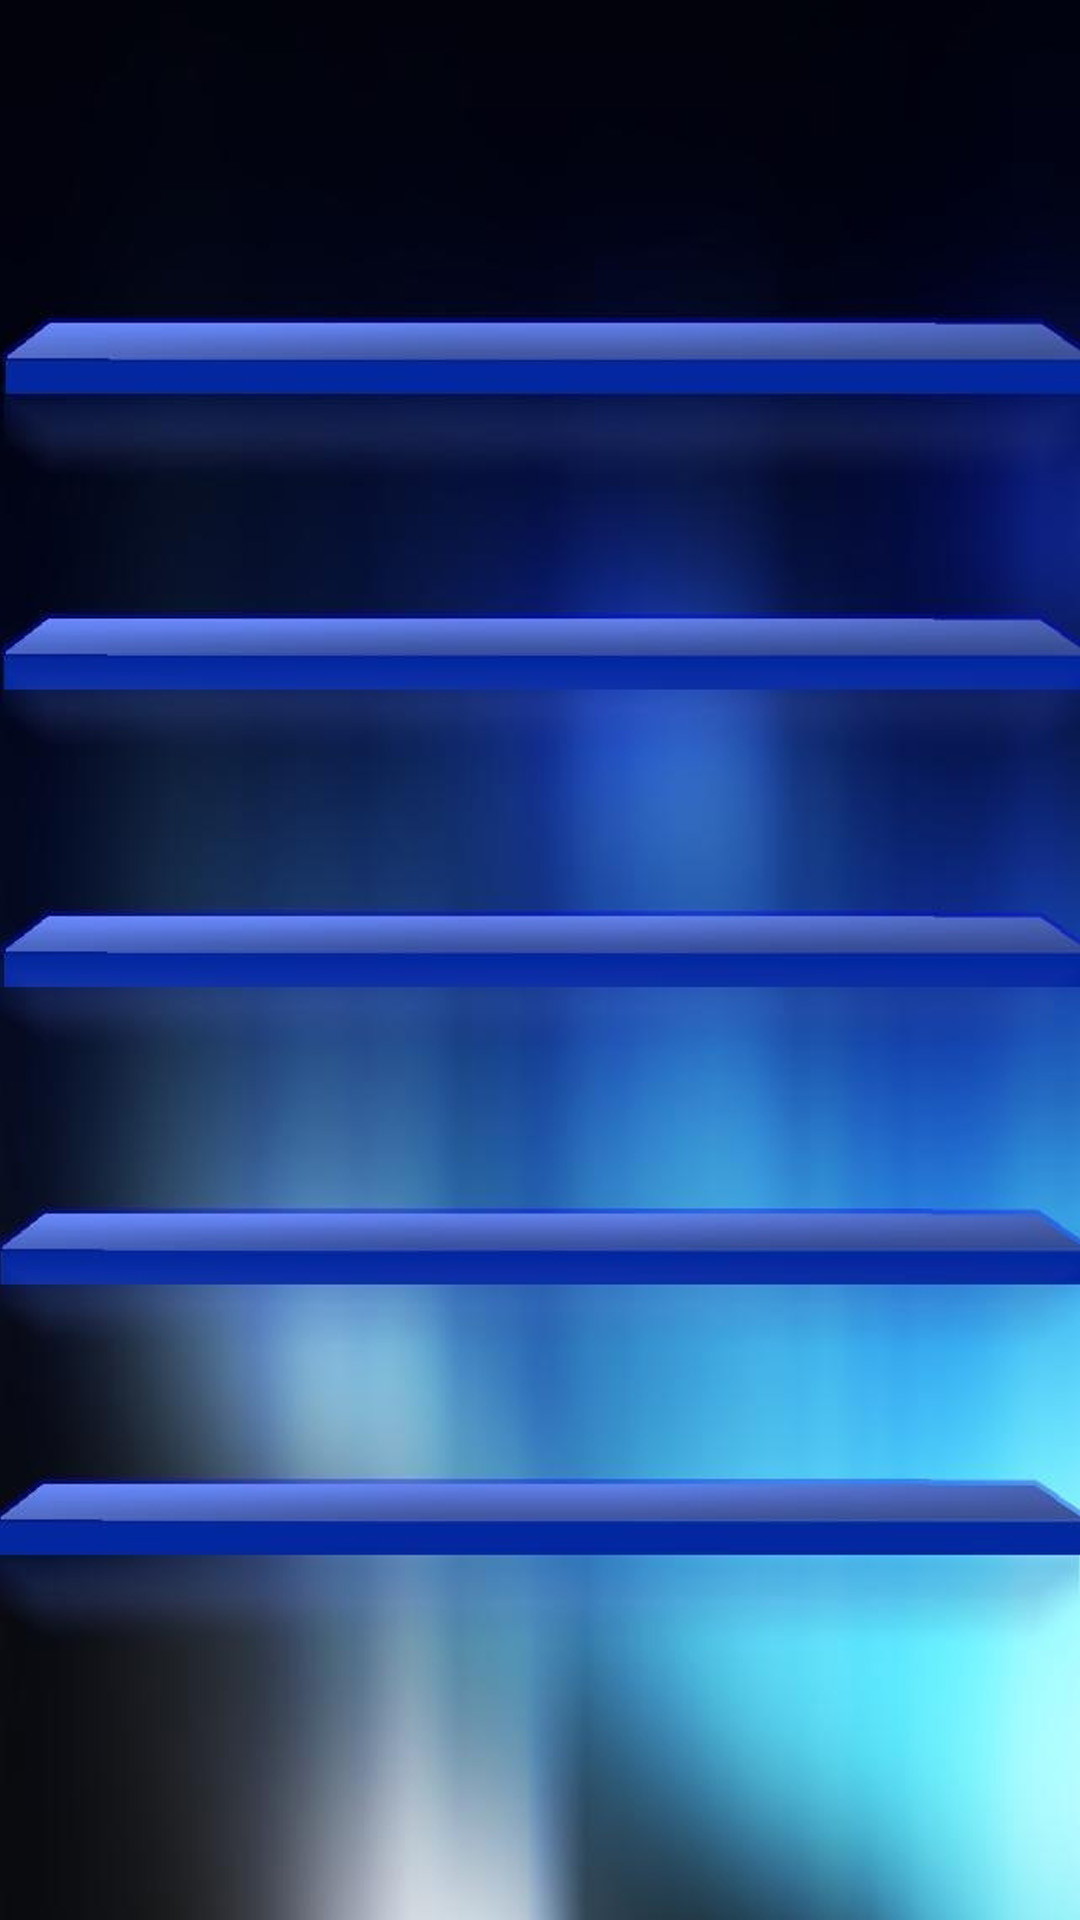 Shelf IPhone 6 Plus Wallpaper 22 Wallpapers HD 1080x1920